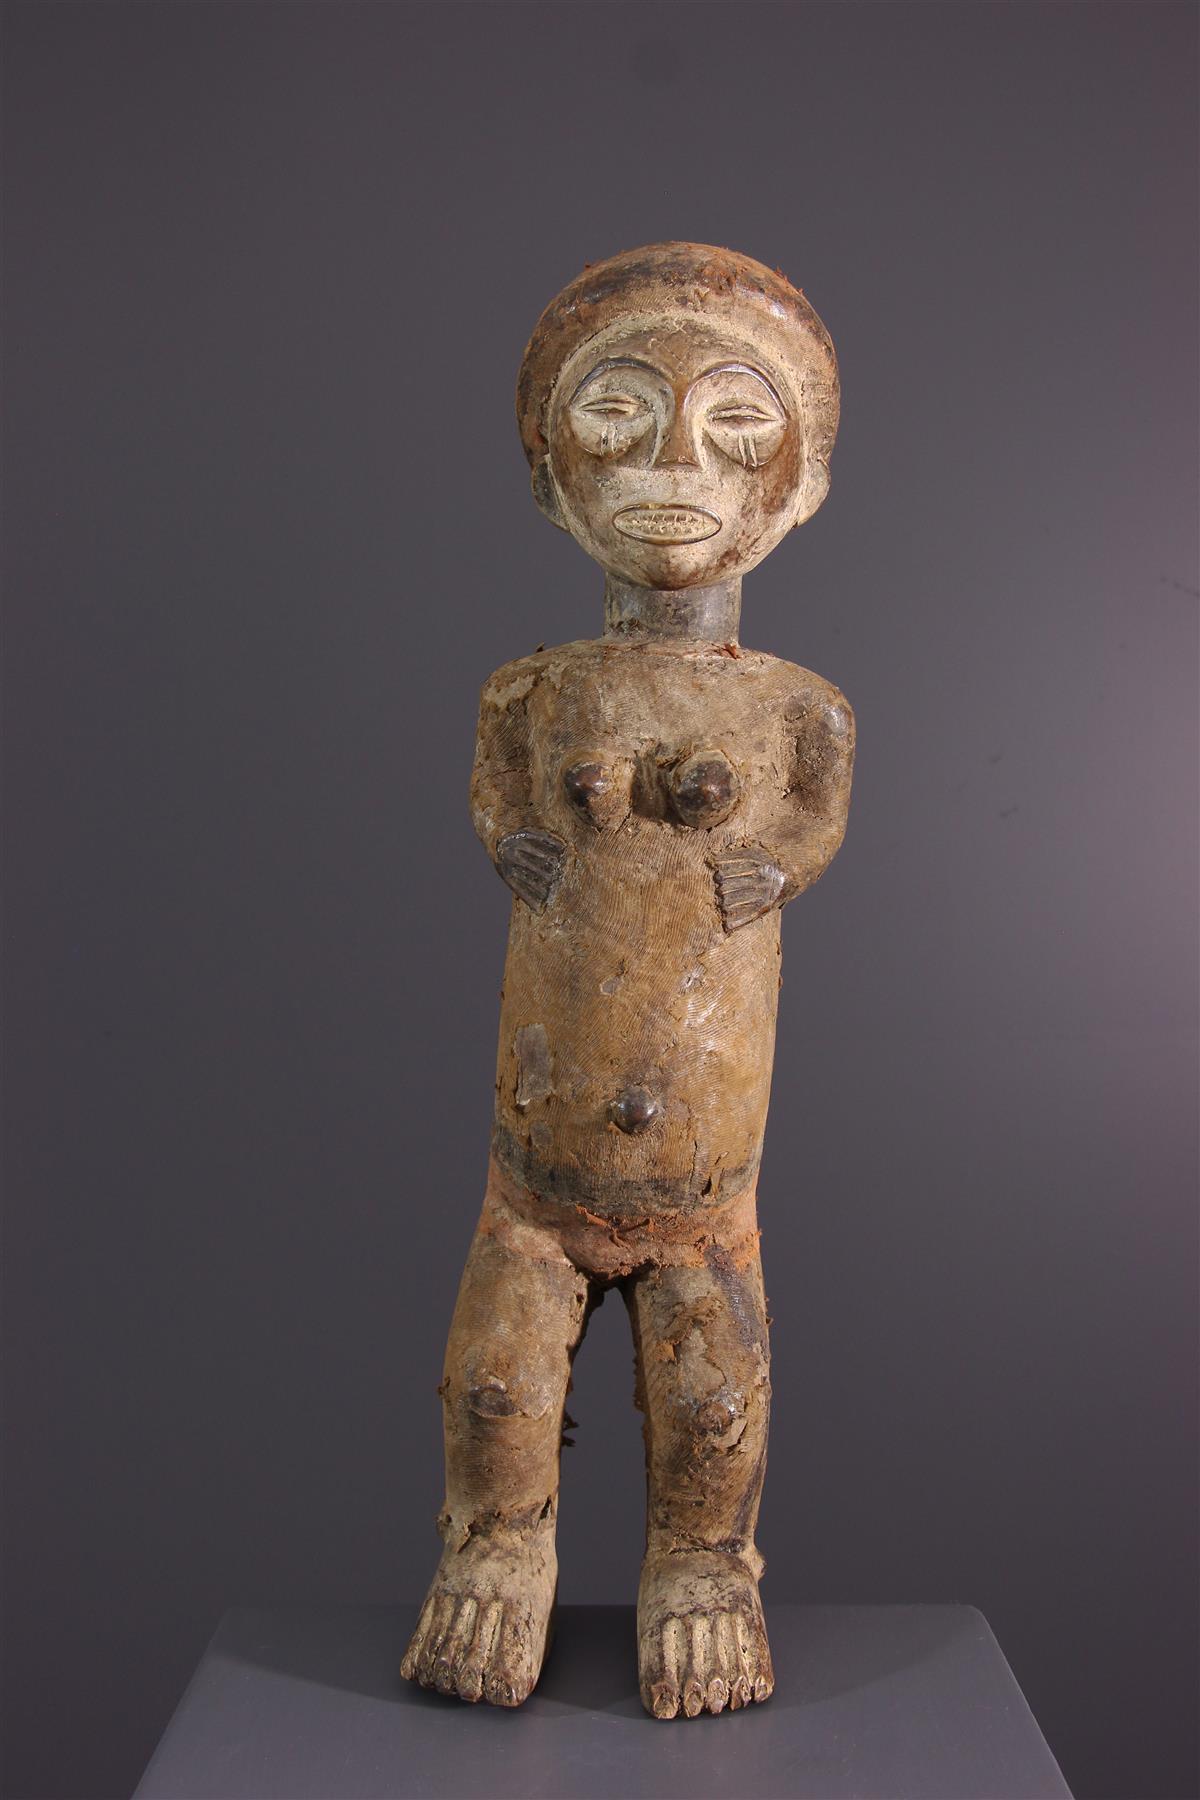 Statue Tschokwe - Tribal art